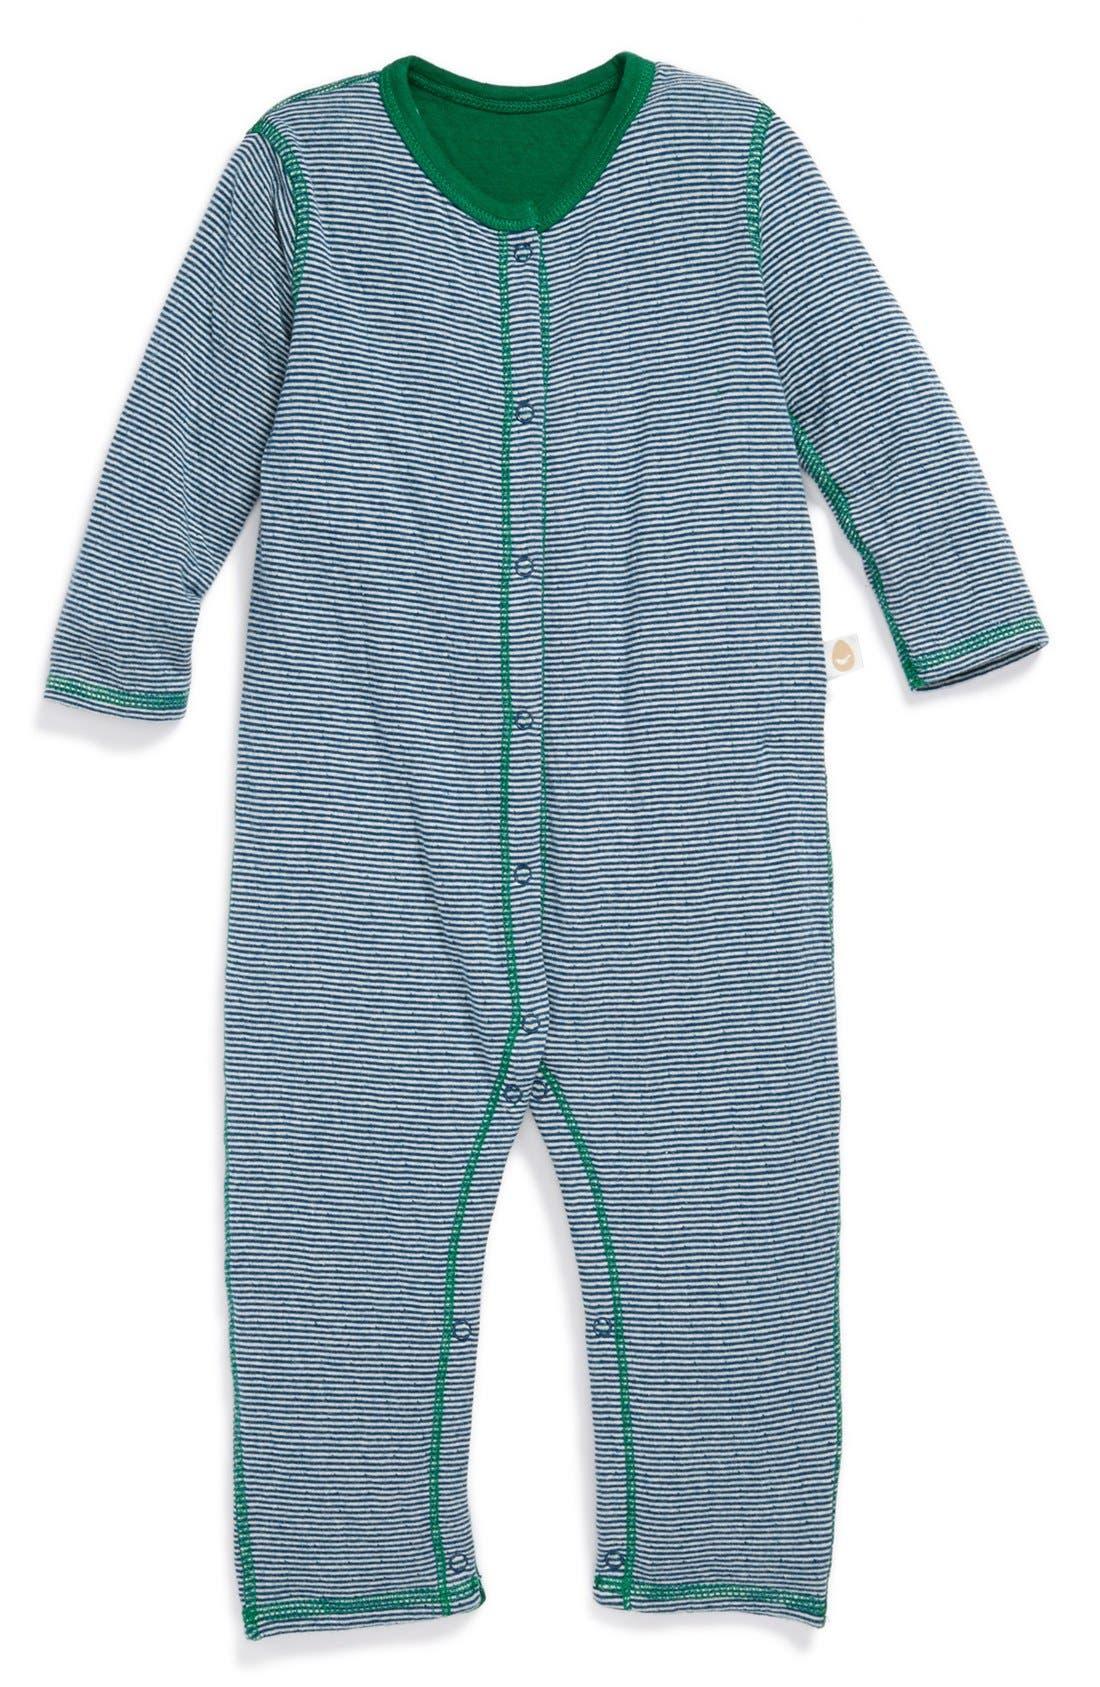 Main Image - Stem Baby Reversible Romper (Baby Boys)